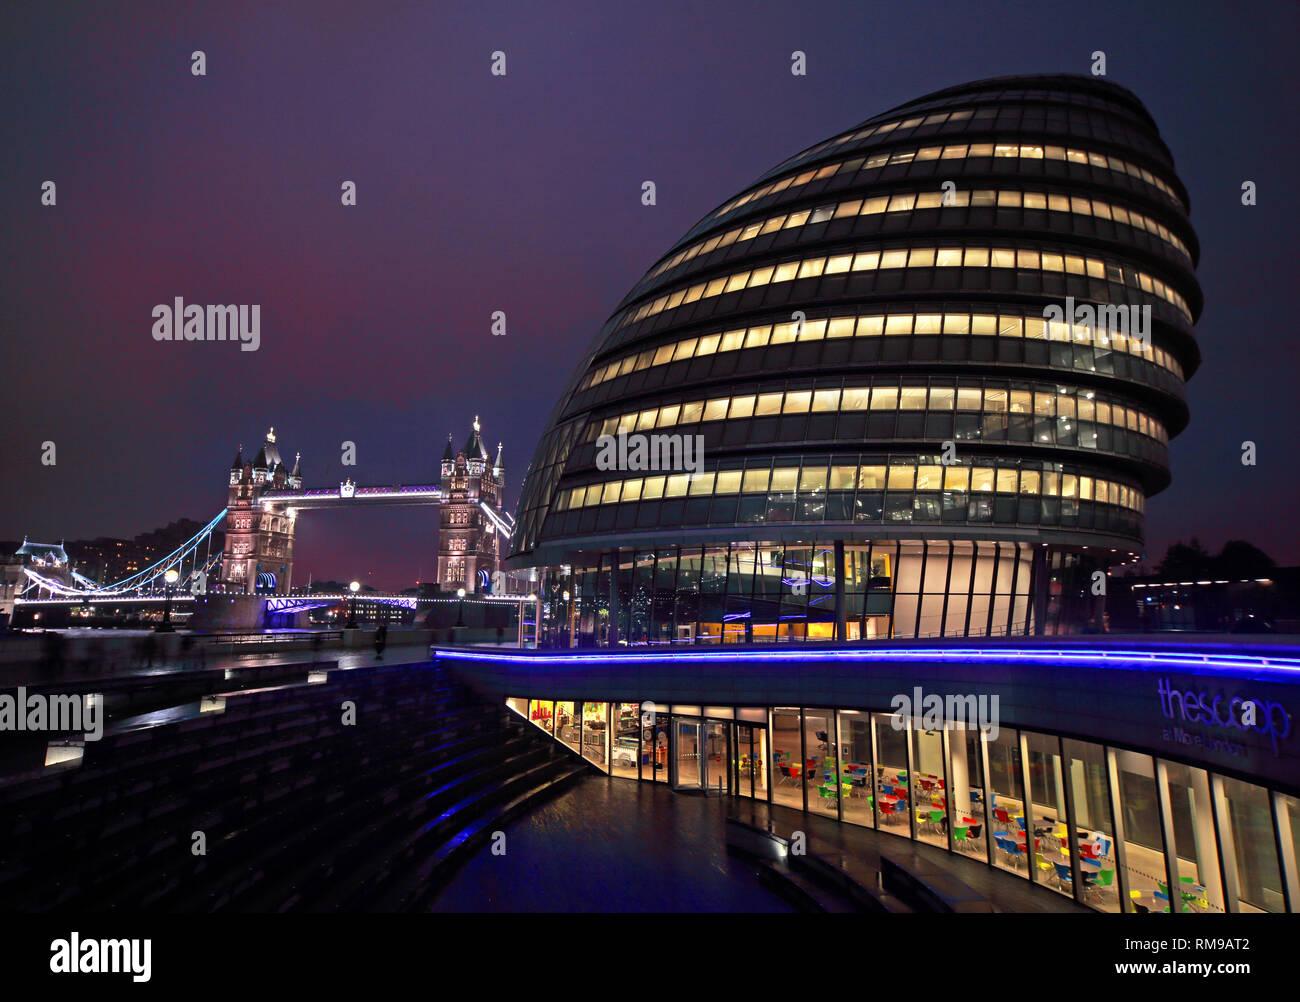 Laden Sie dieses Alamy Stockfoto London City Hall am Abend, der Queen's Walk, London, England, UK, SE1 2AA - RM9AT2